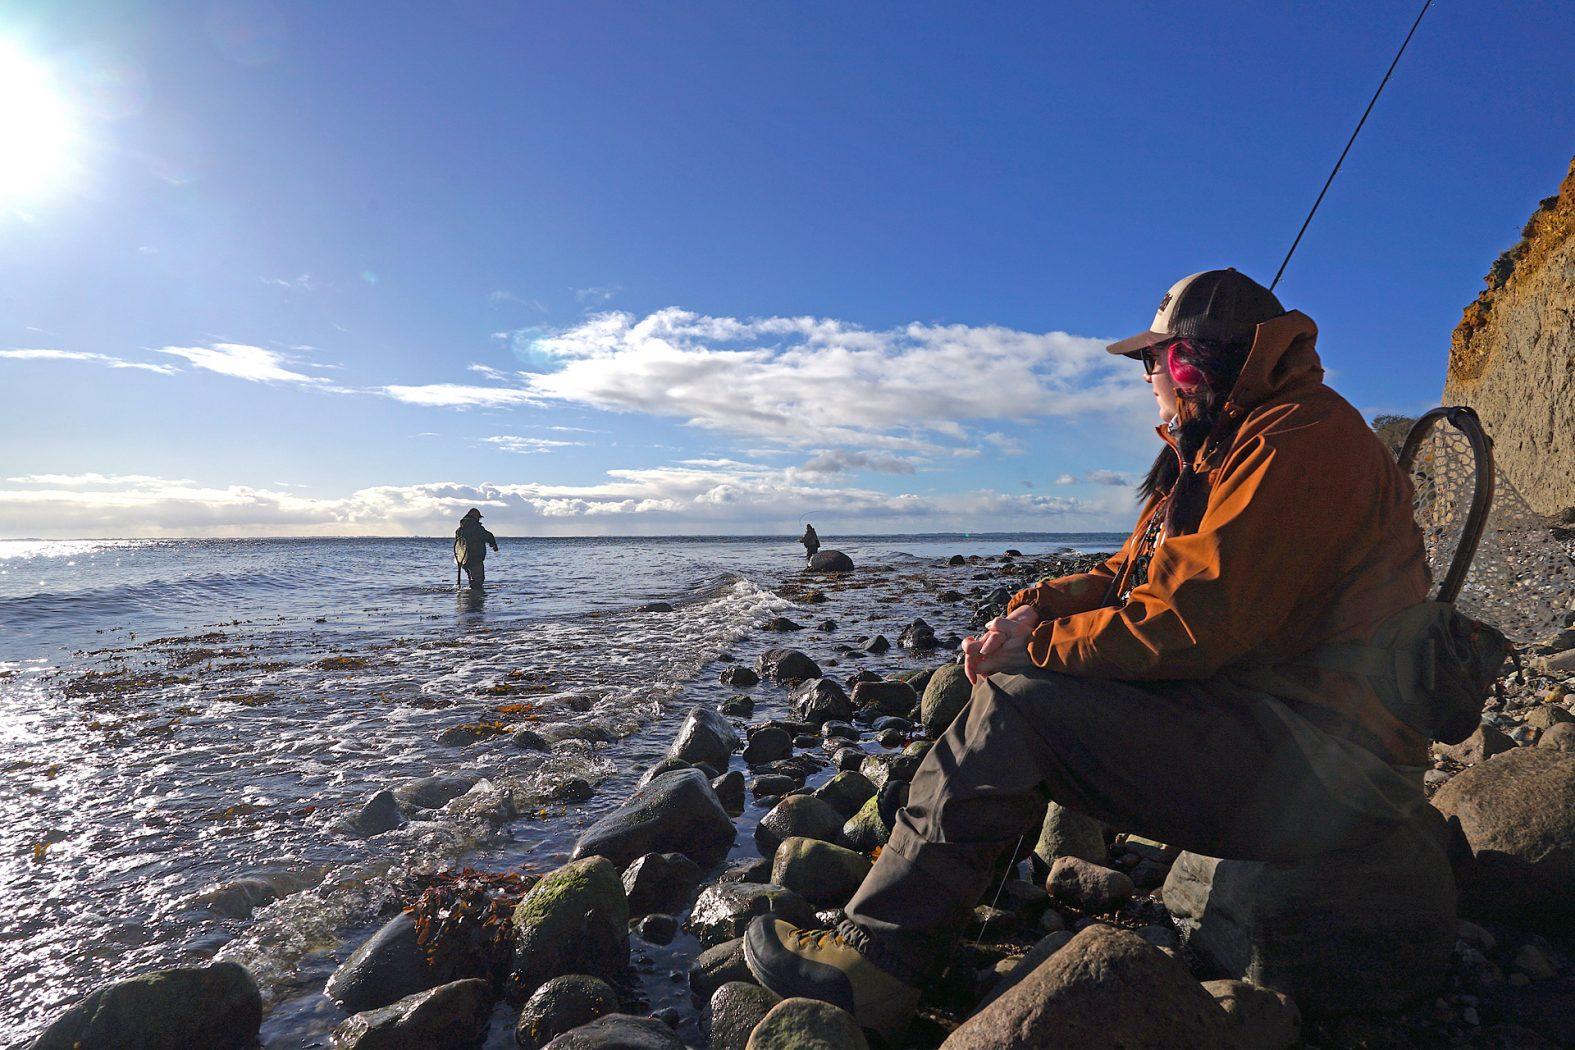 Meerforellenangeln in Süd-Dänemark